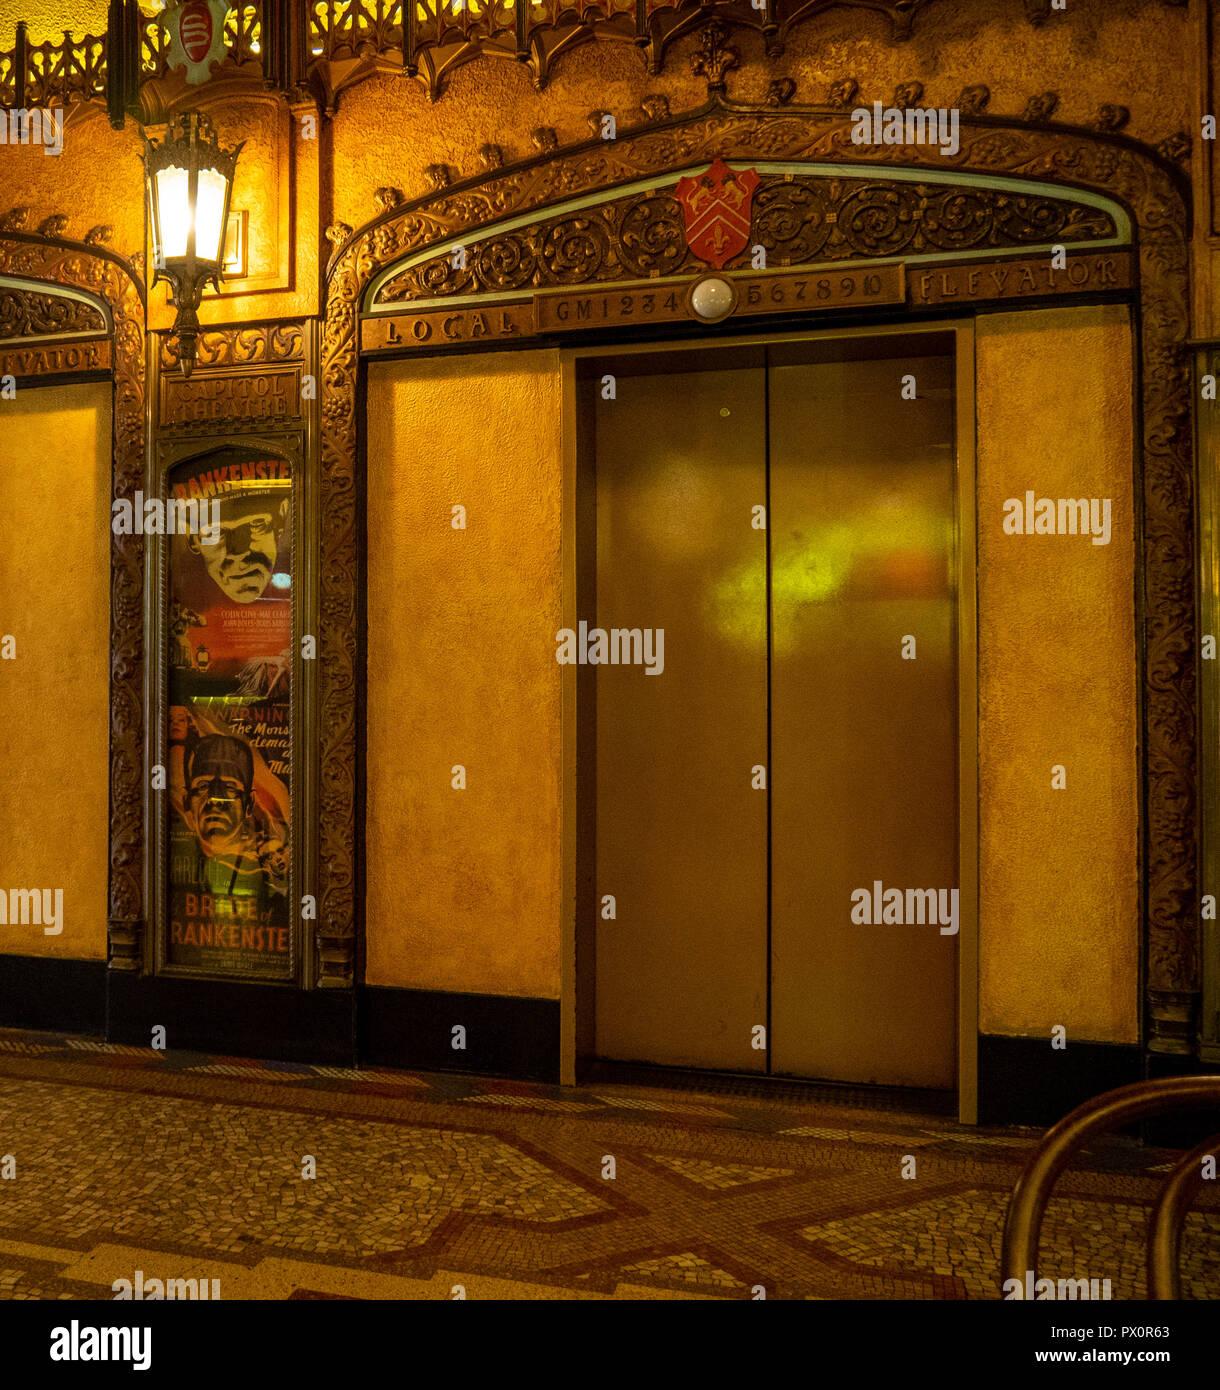 Art Deco ornate elevator in the lobby of the QT Hotel Market Street Sydney NSW Australia. - Stock Image